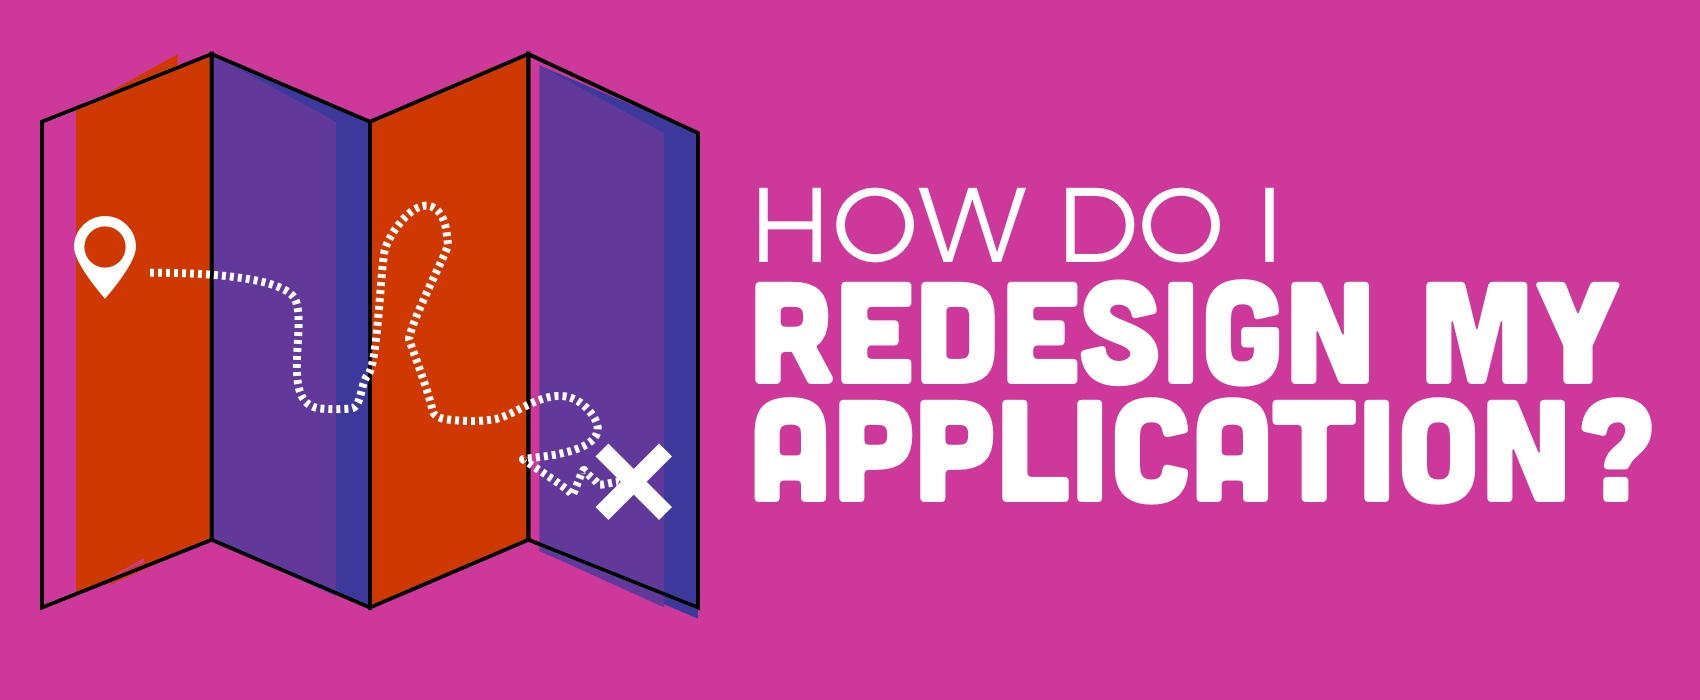 How Do I Redesign My Web Application?